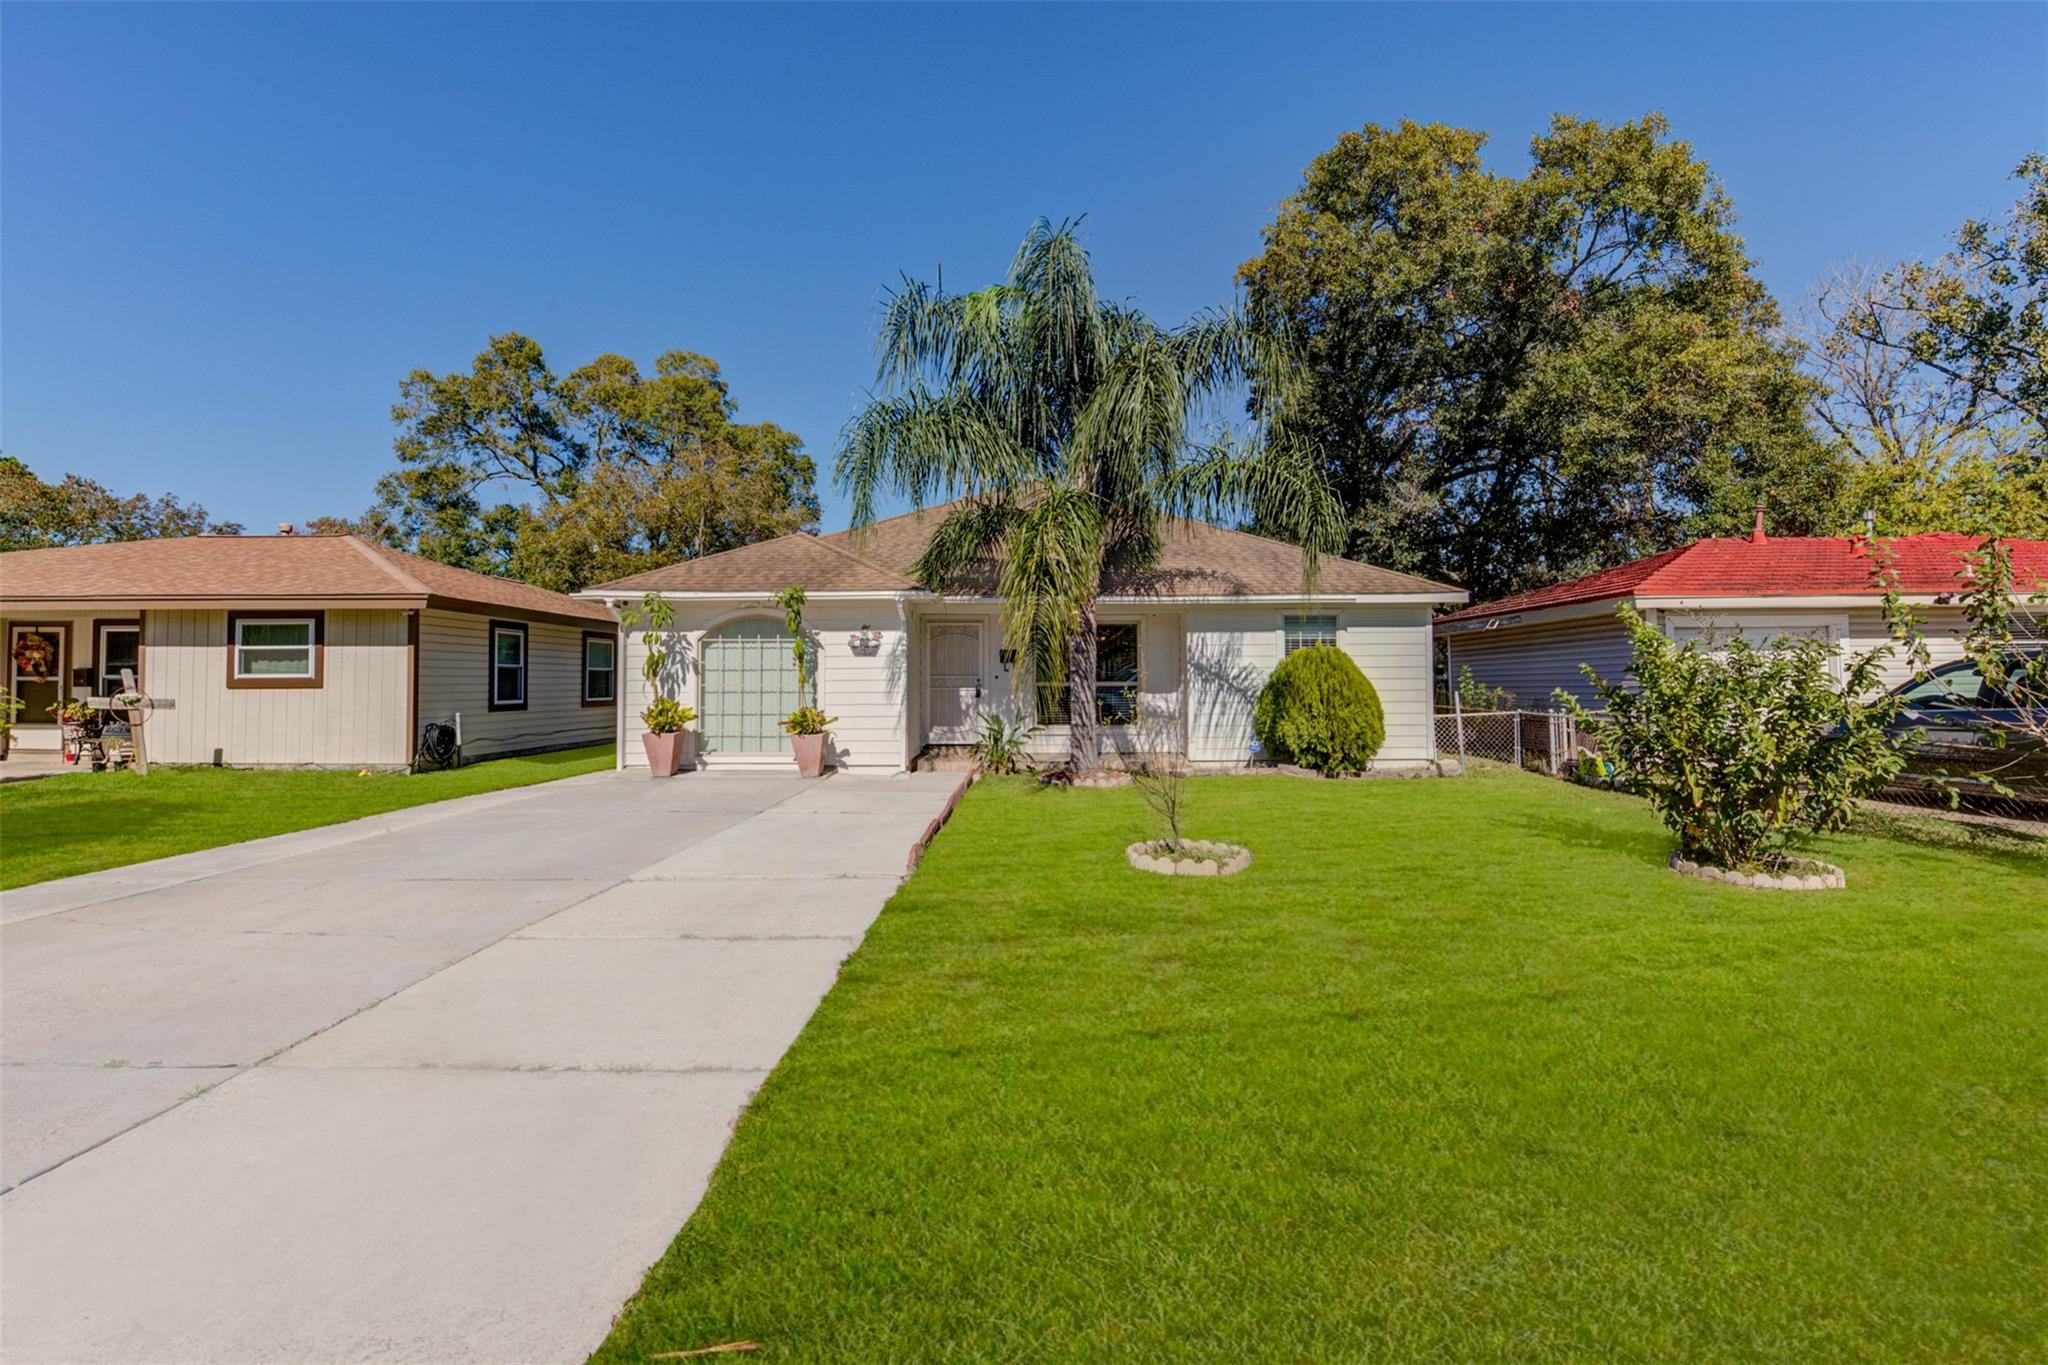 409 Avenue E Property Photo - South Houston, TX real estate listing